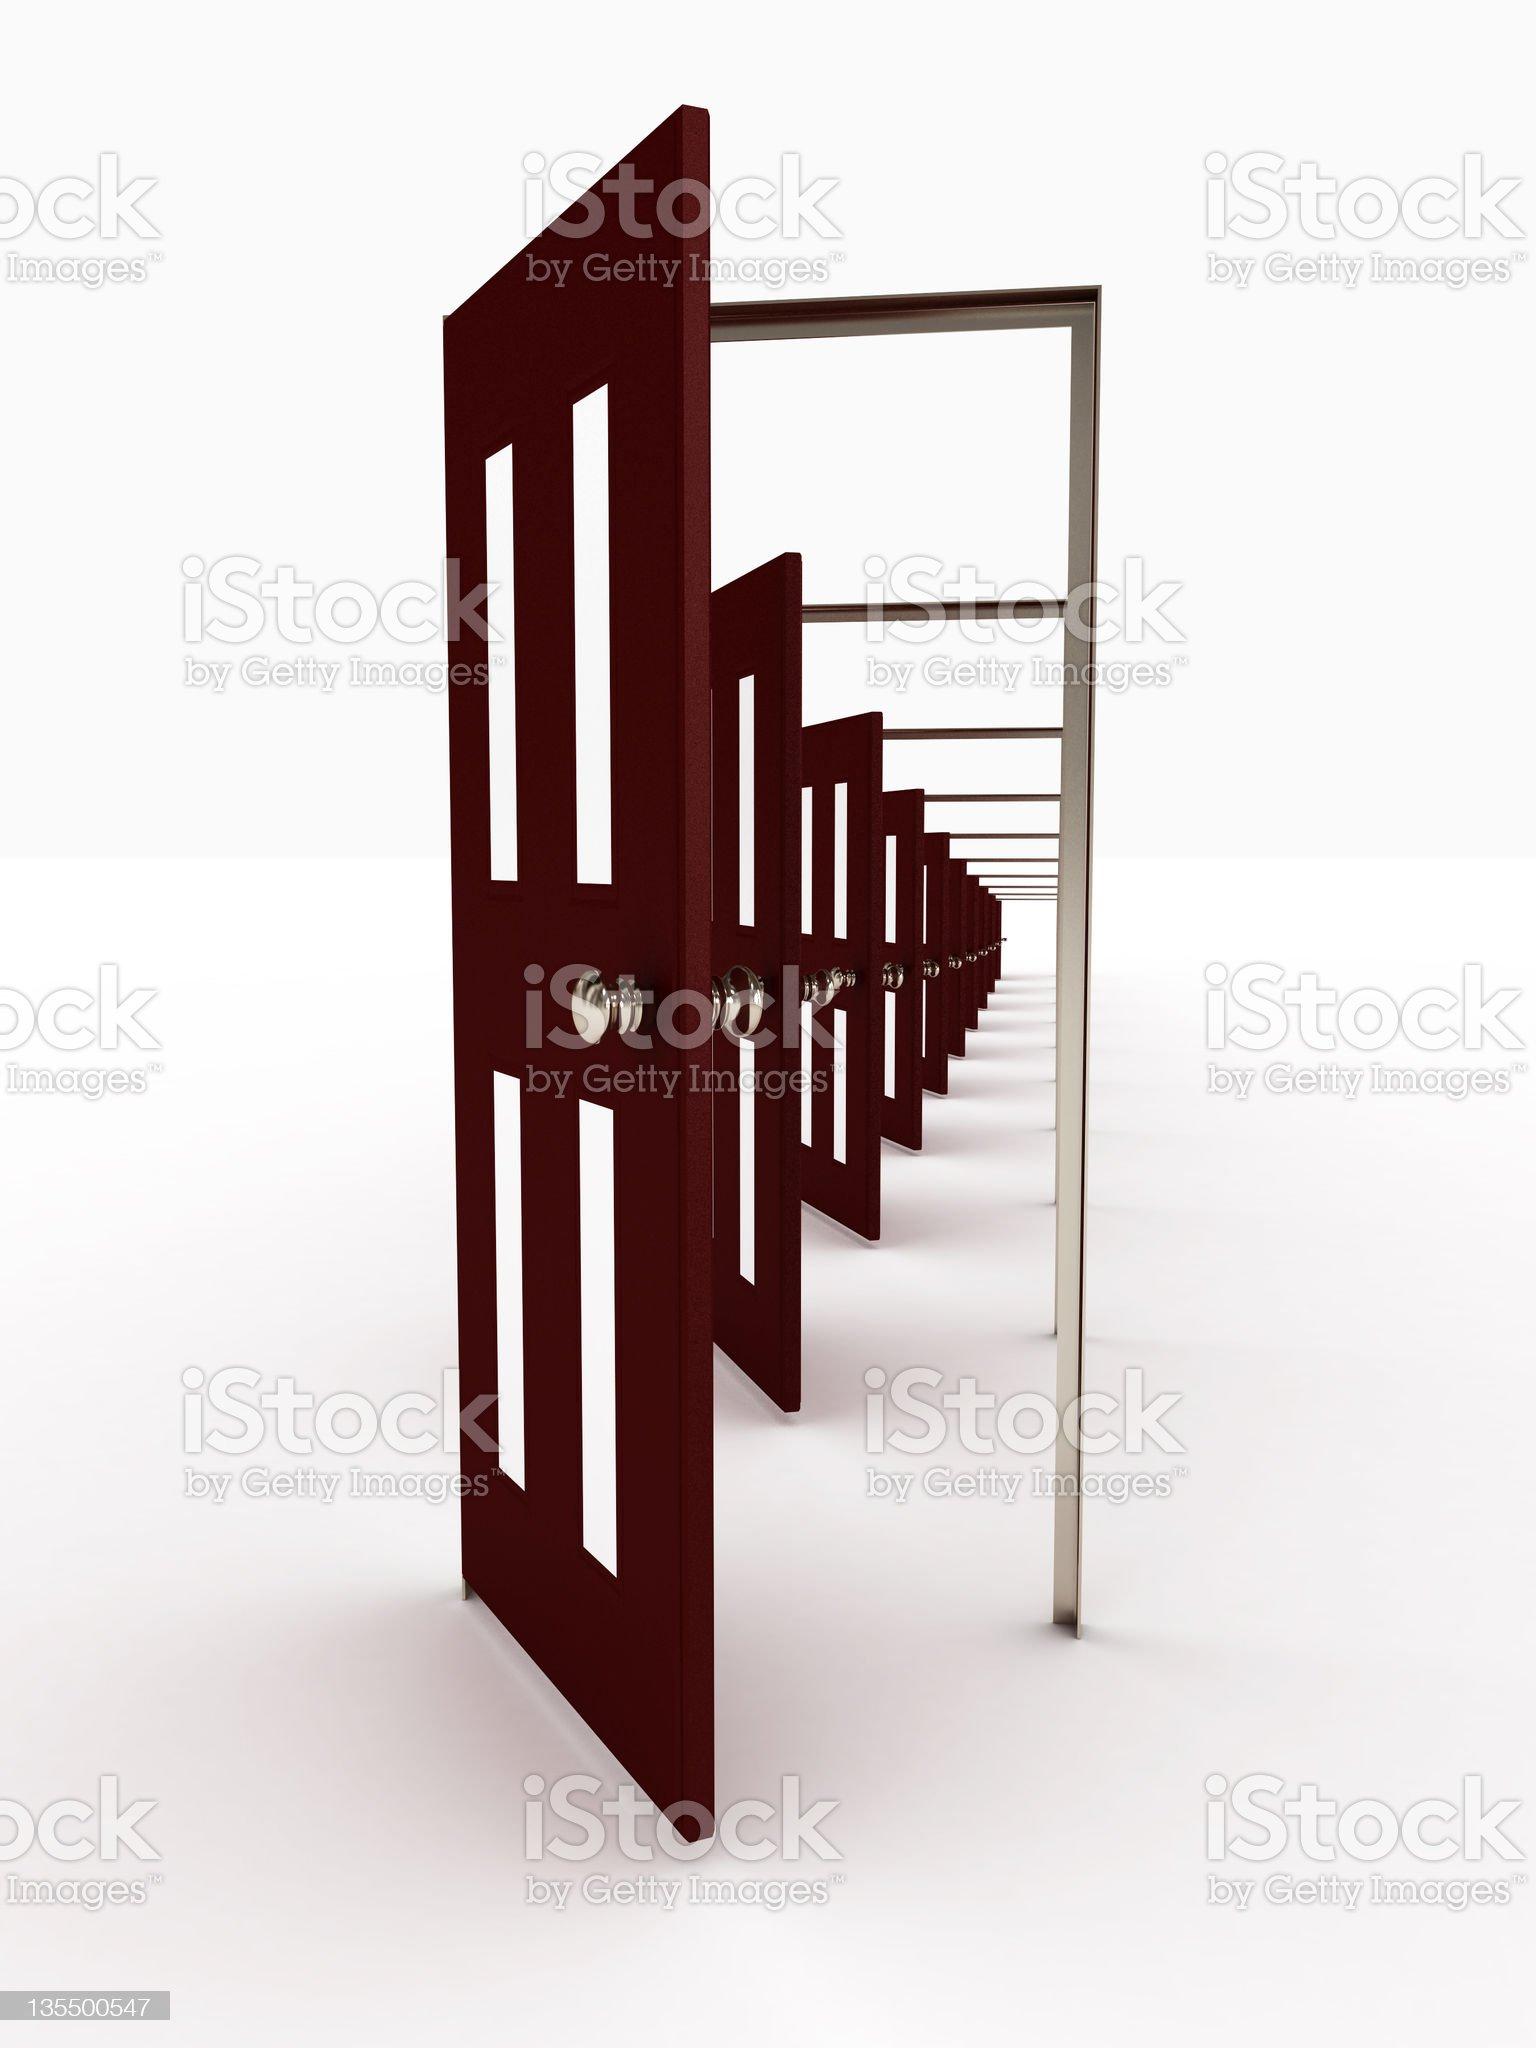 Many open doors isolated on white background. 3D image royalty-free stock photo